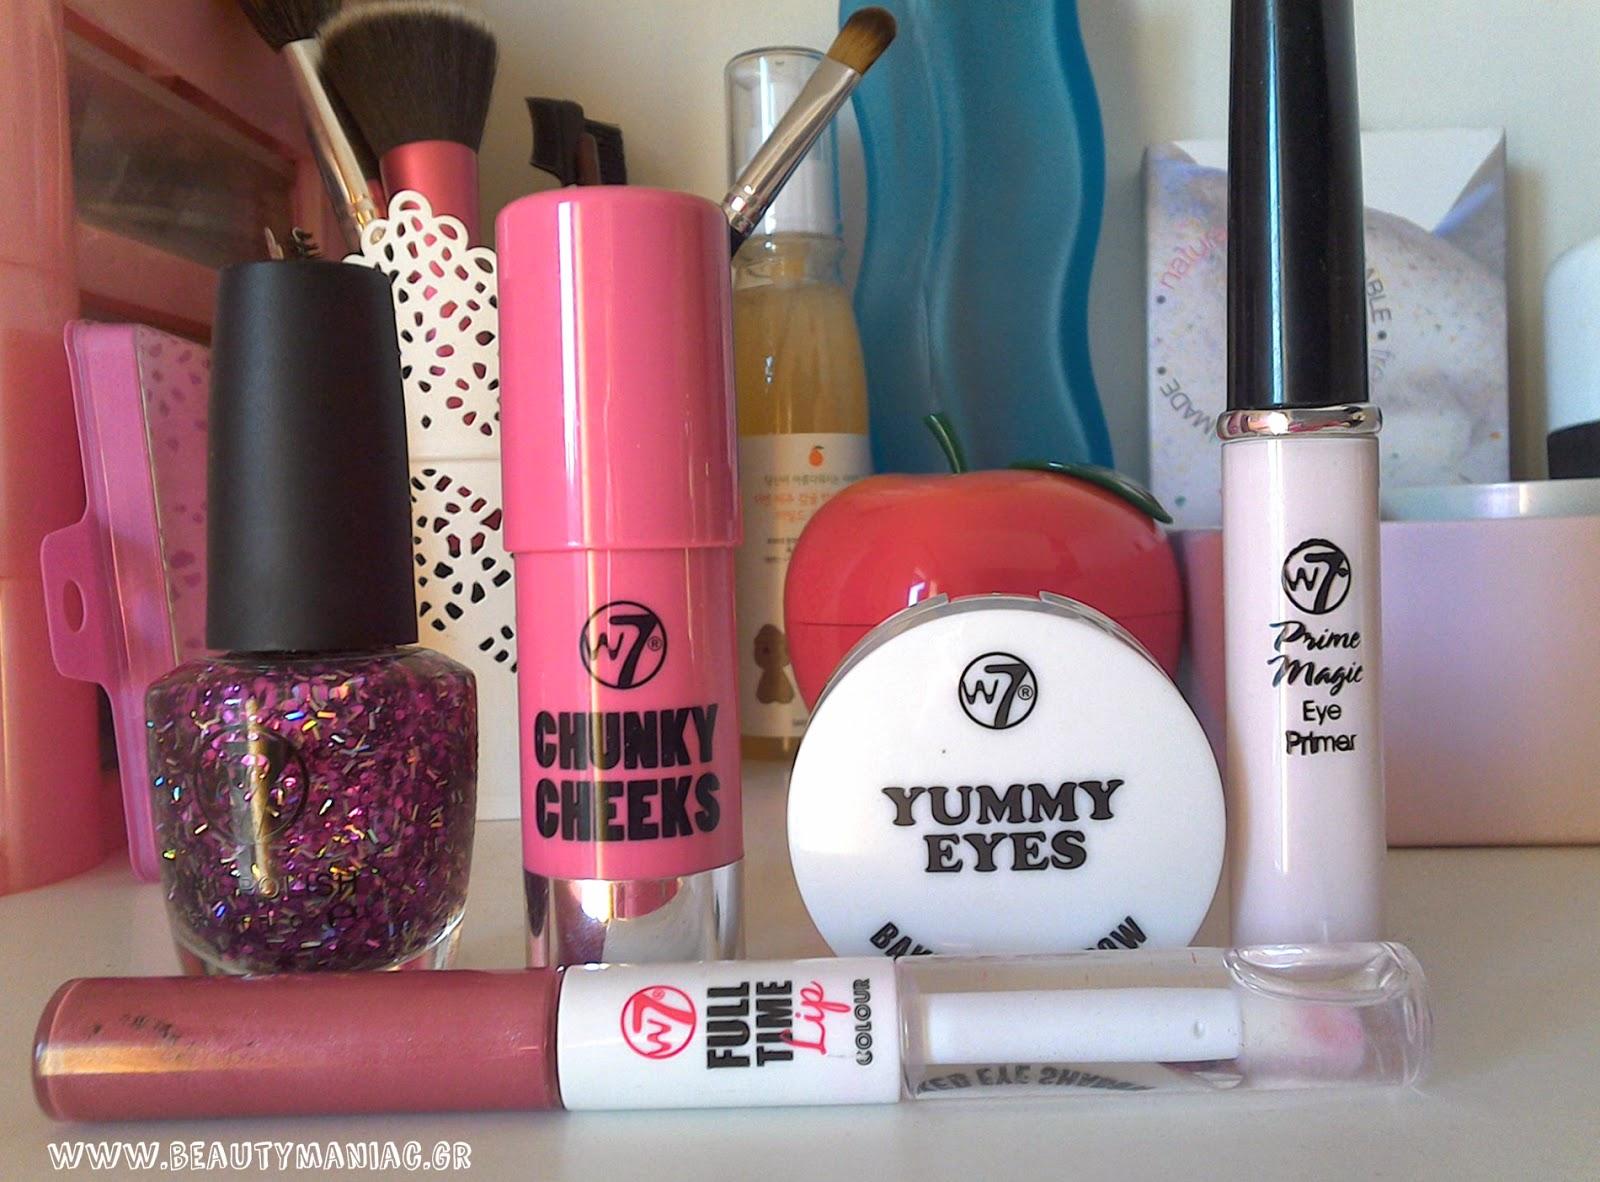 4b2735d89e3 Beauty Maniac - Εδώ μιλάμε για ομορφιά!: 5 Makeup Products I am loving by  w7!